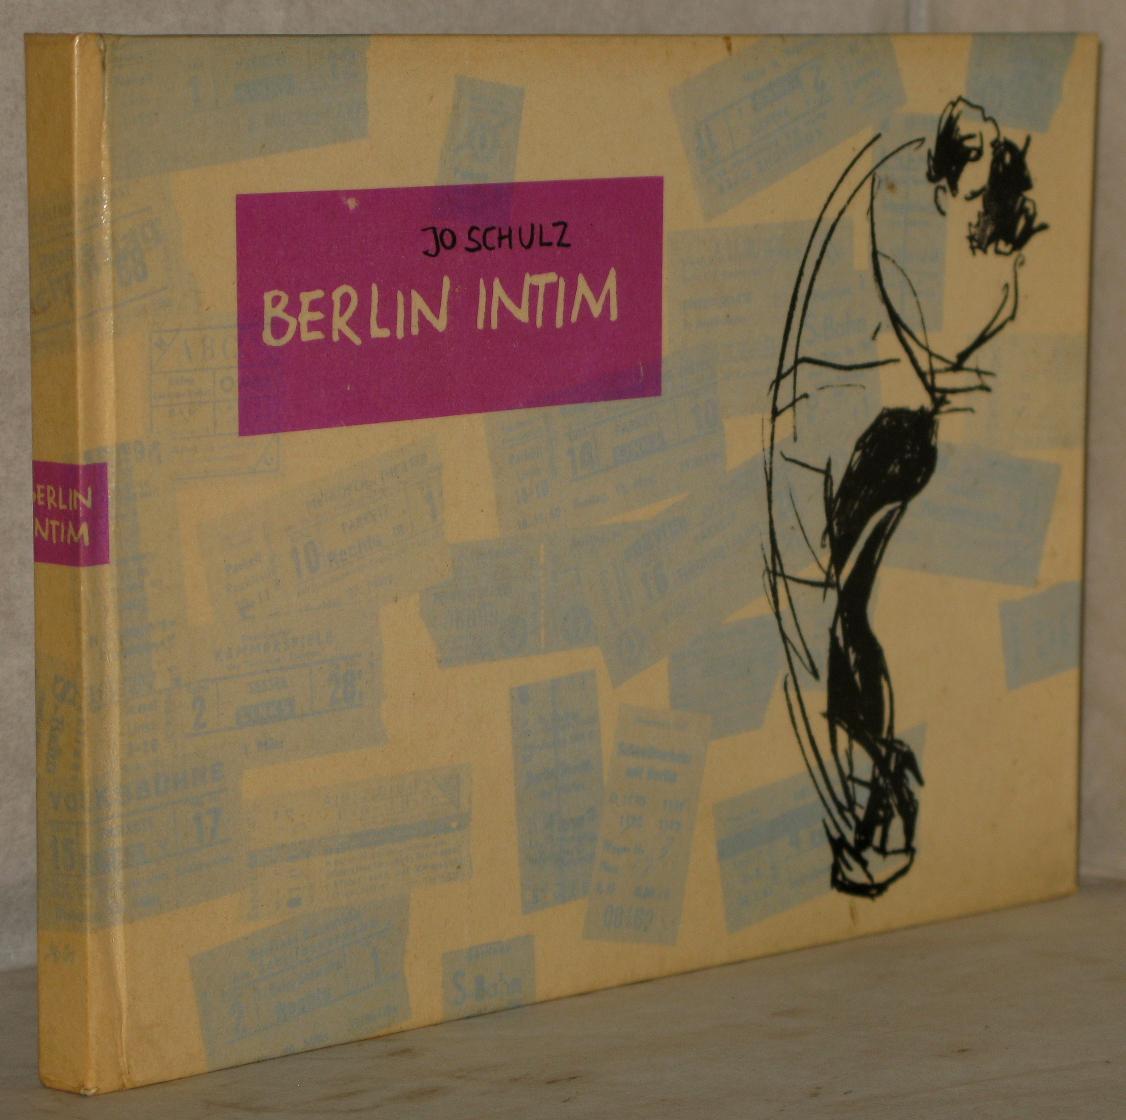 Berlin Imtim